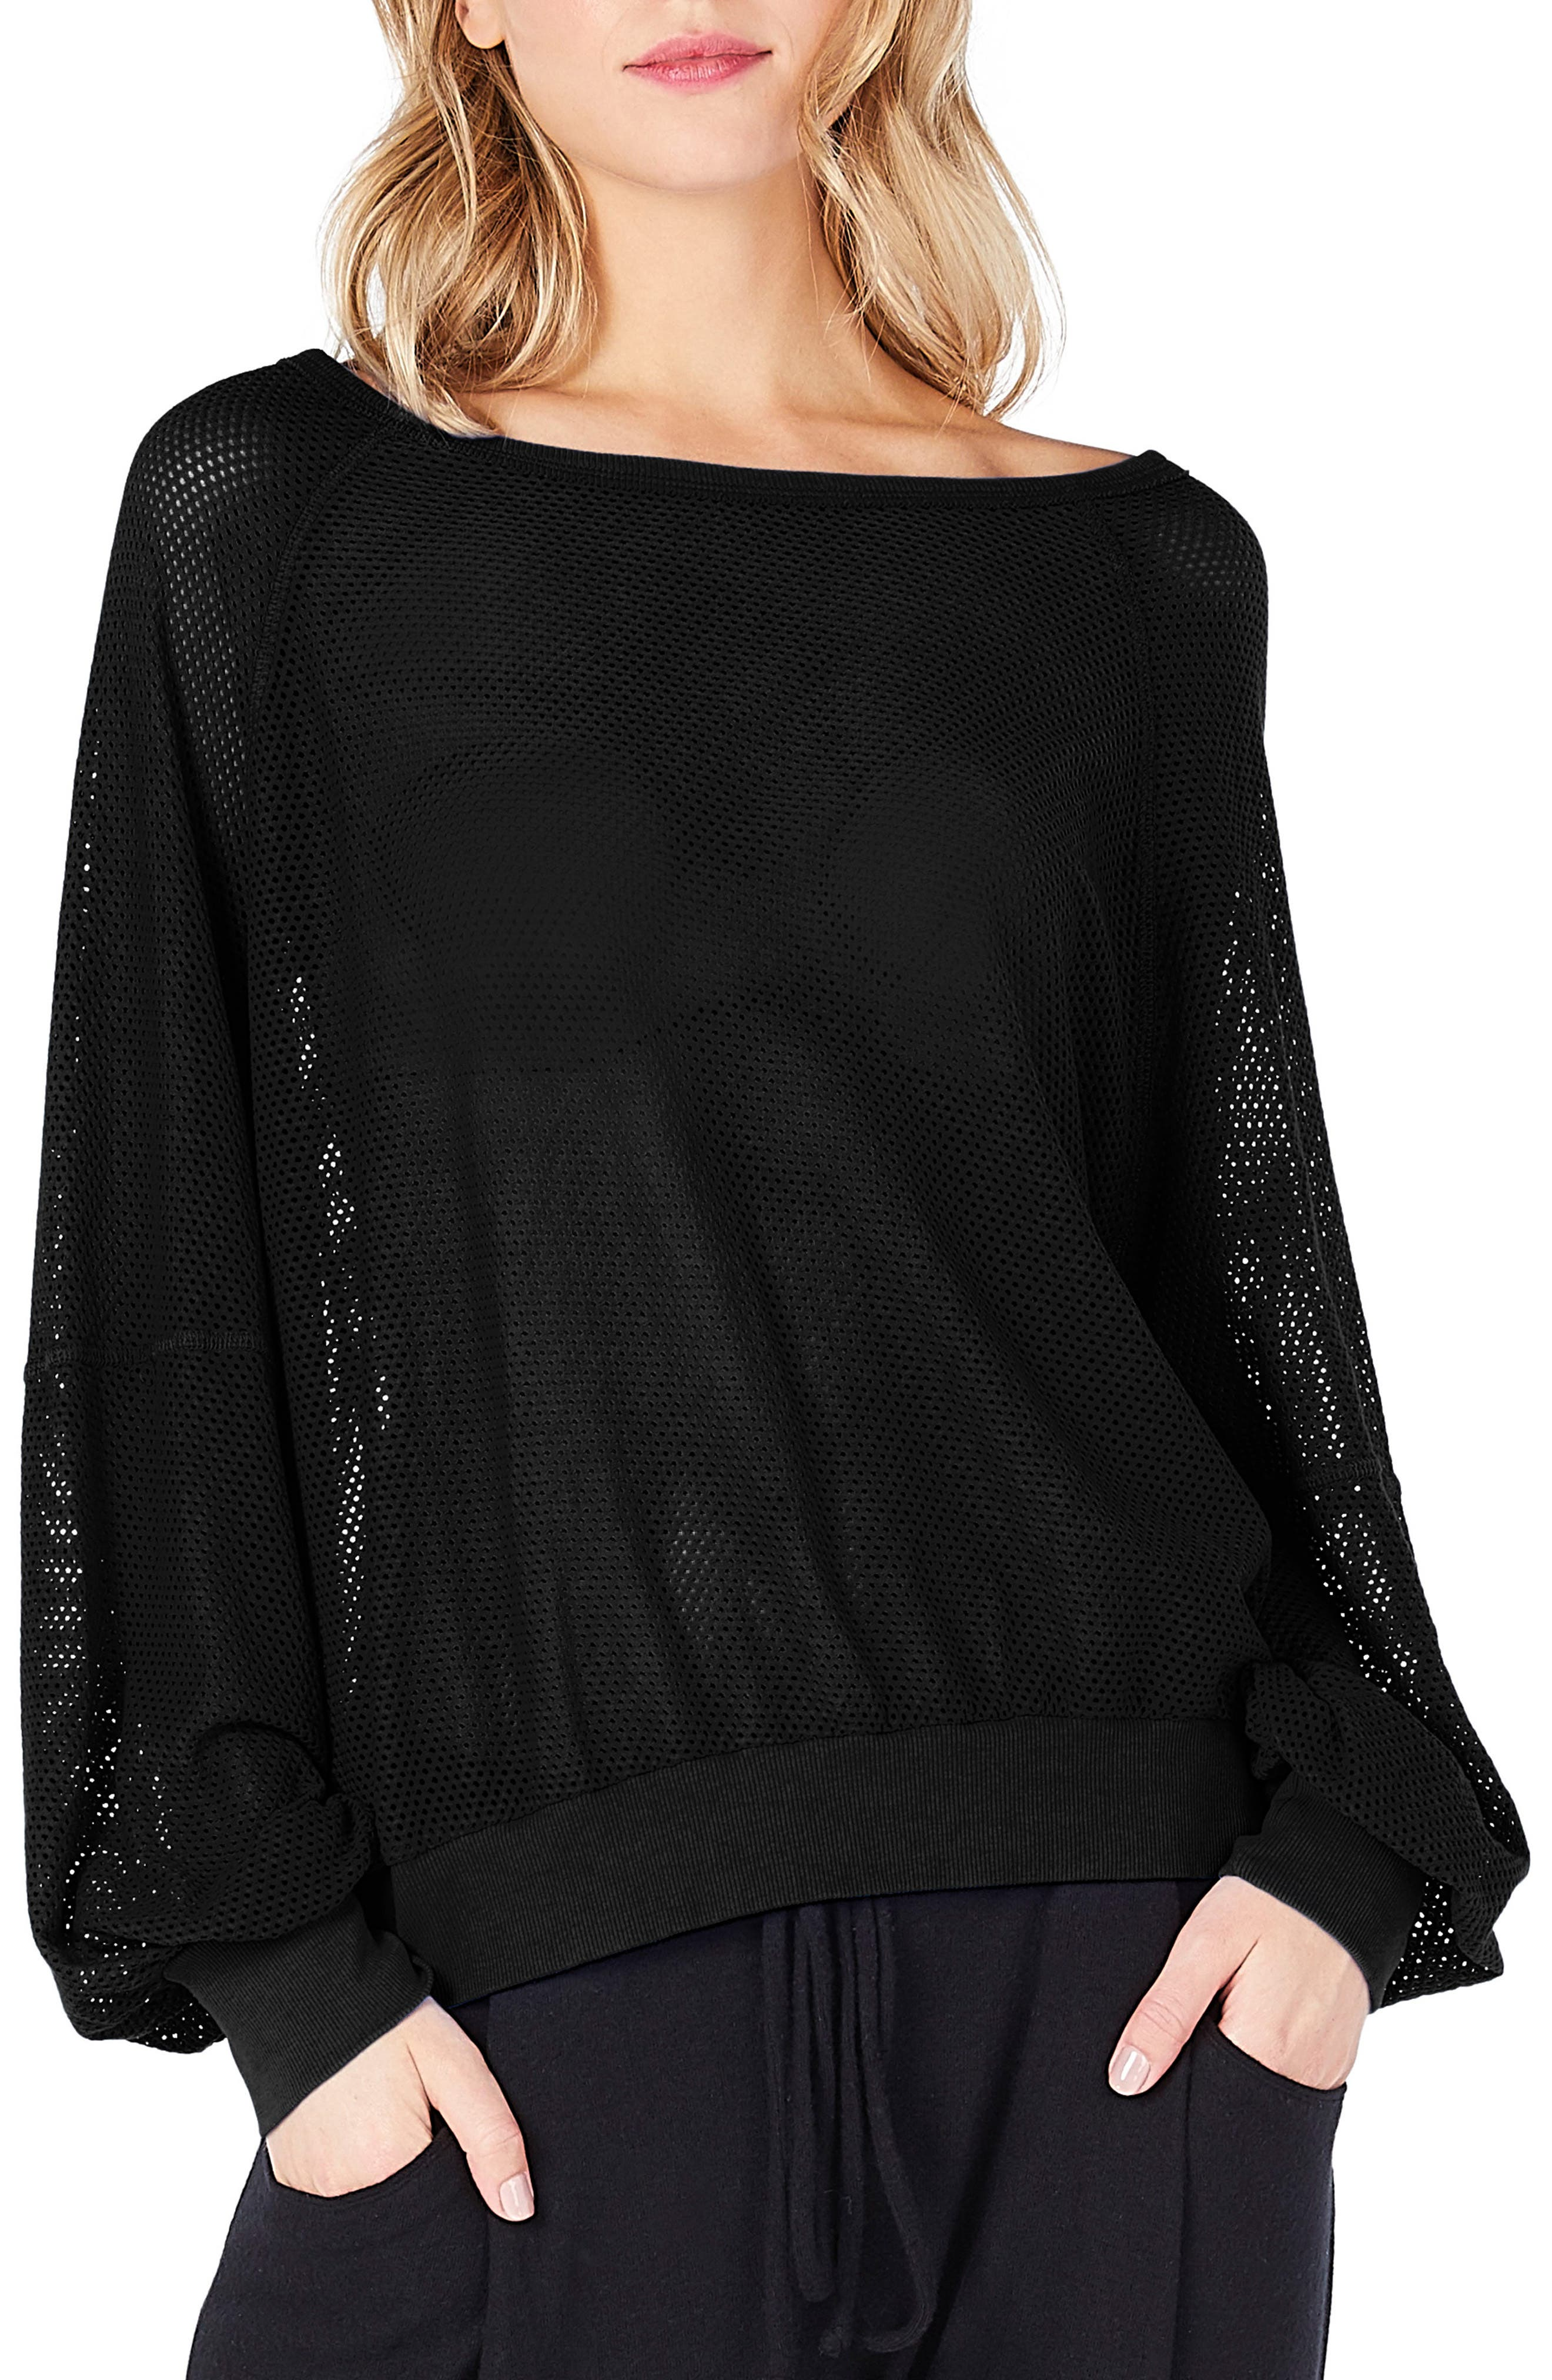 Open Stitch Sweatshirt,                         Main,                         color, 001